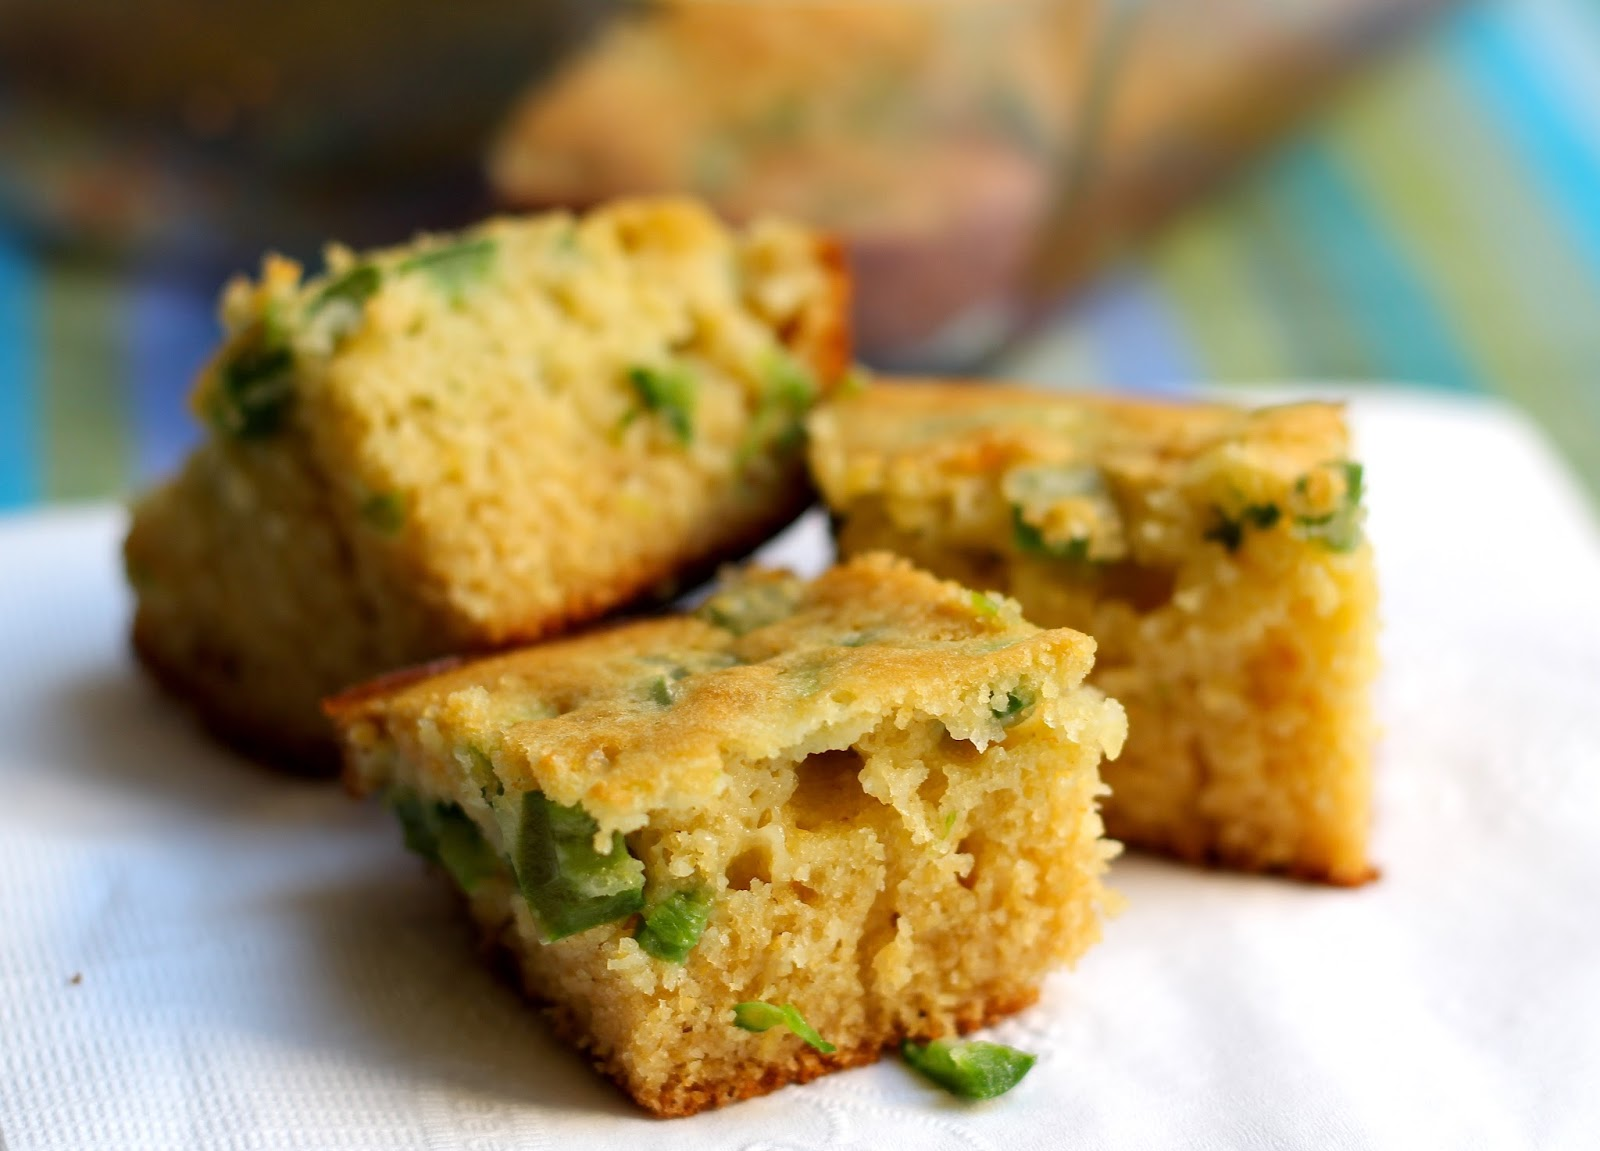 ... WITH LOVE by..... The Burmese Mom: Honey Jalapeno Cornbread